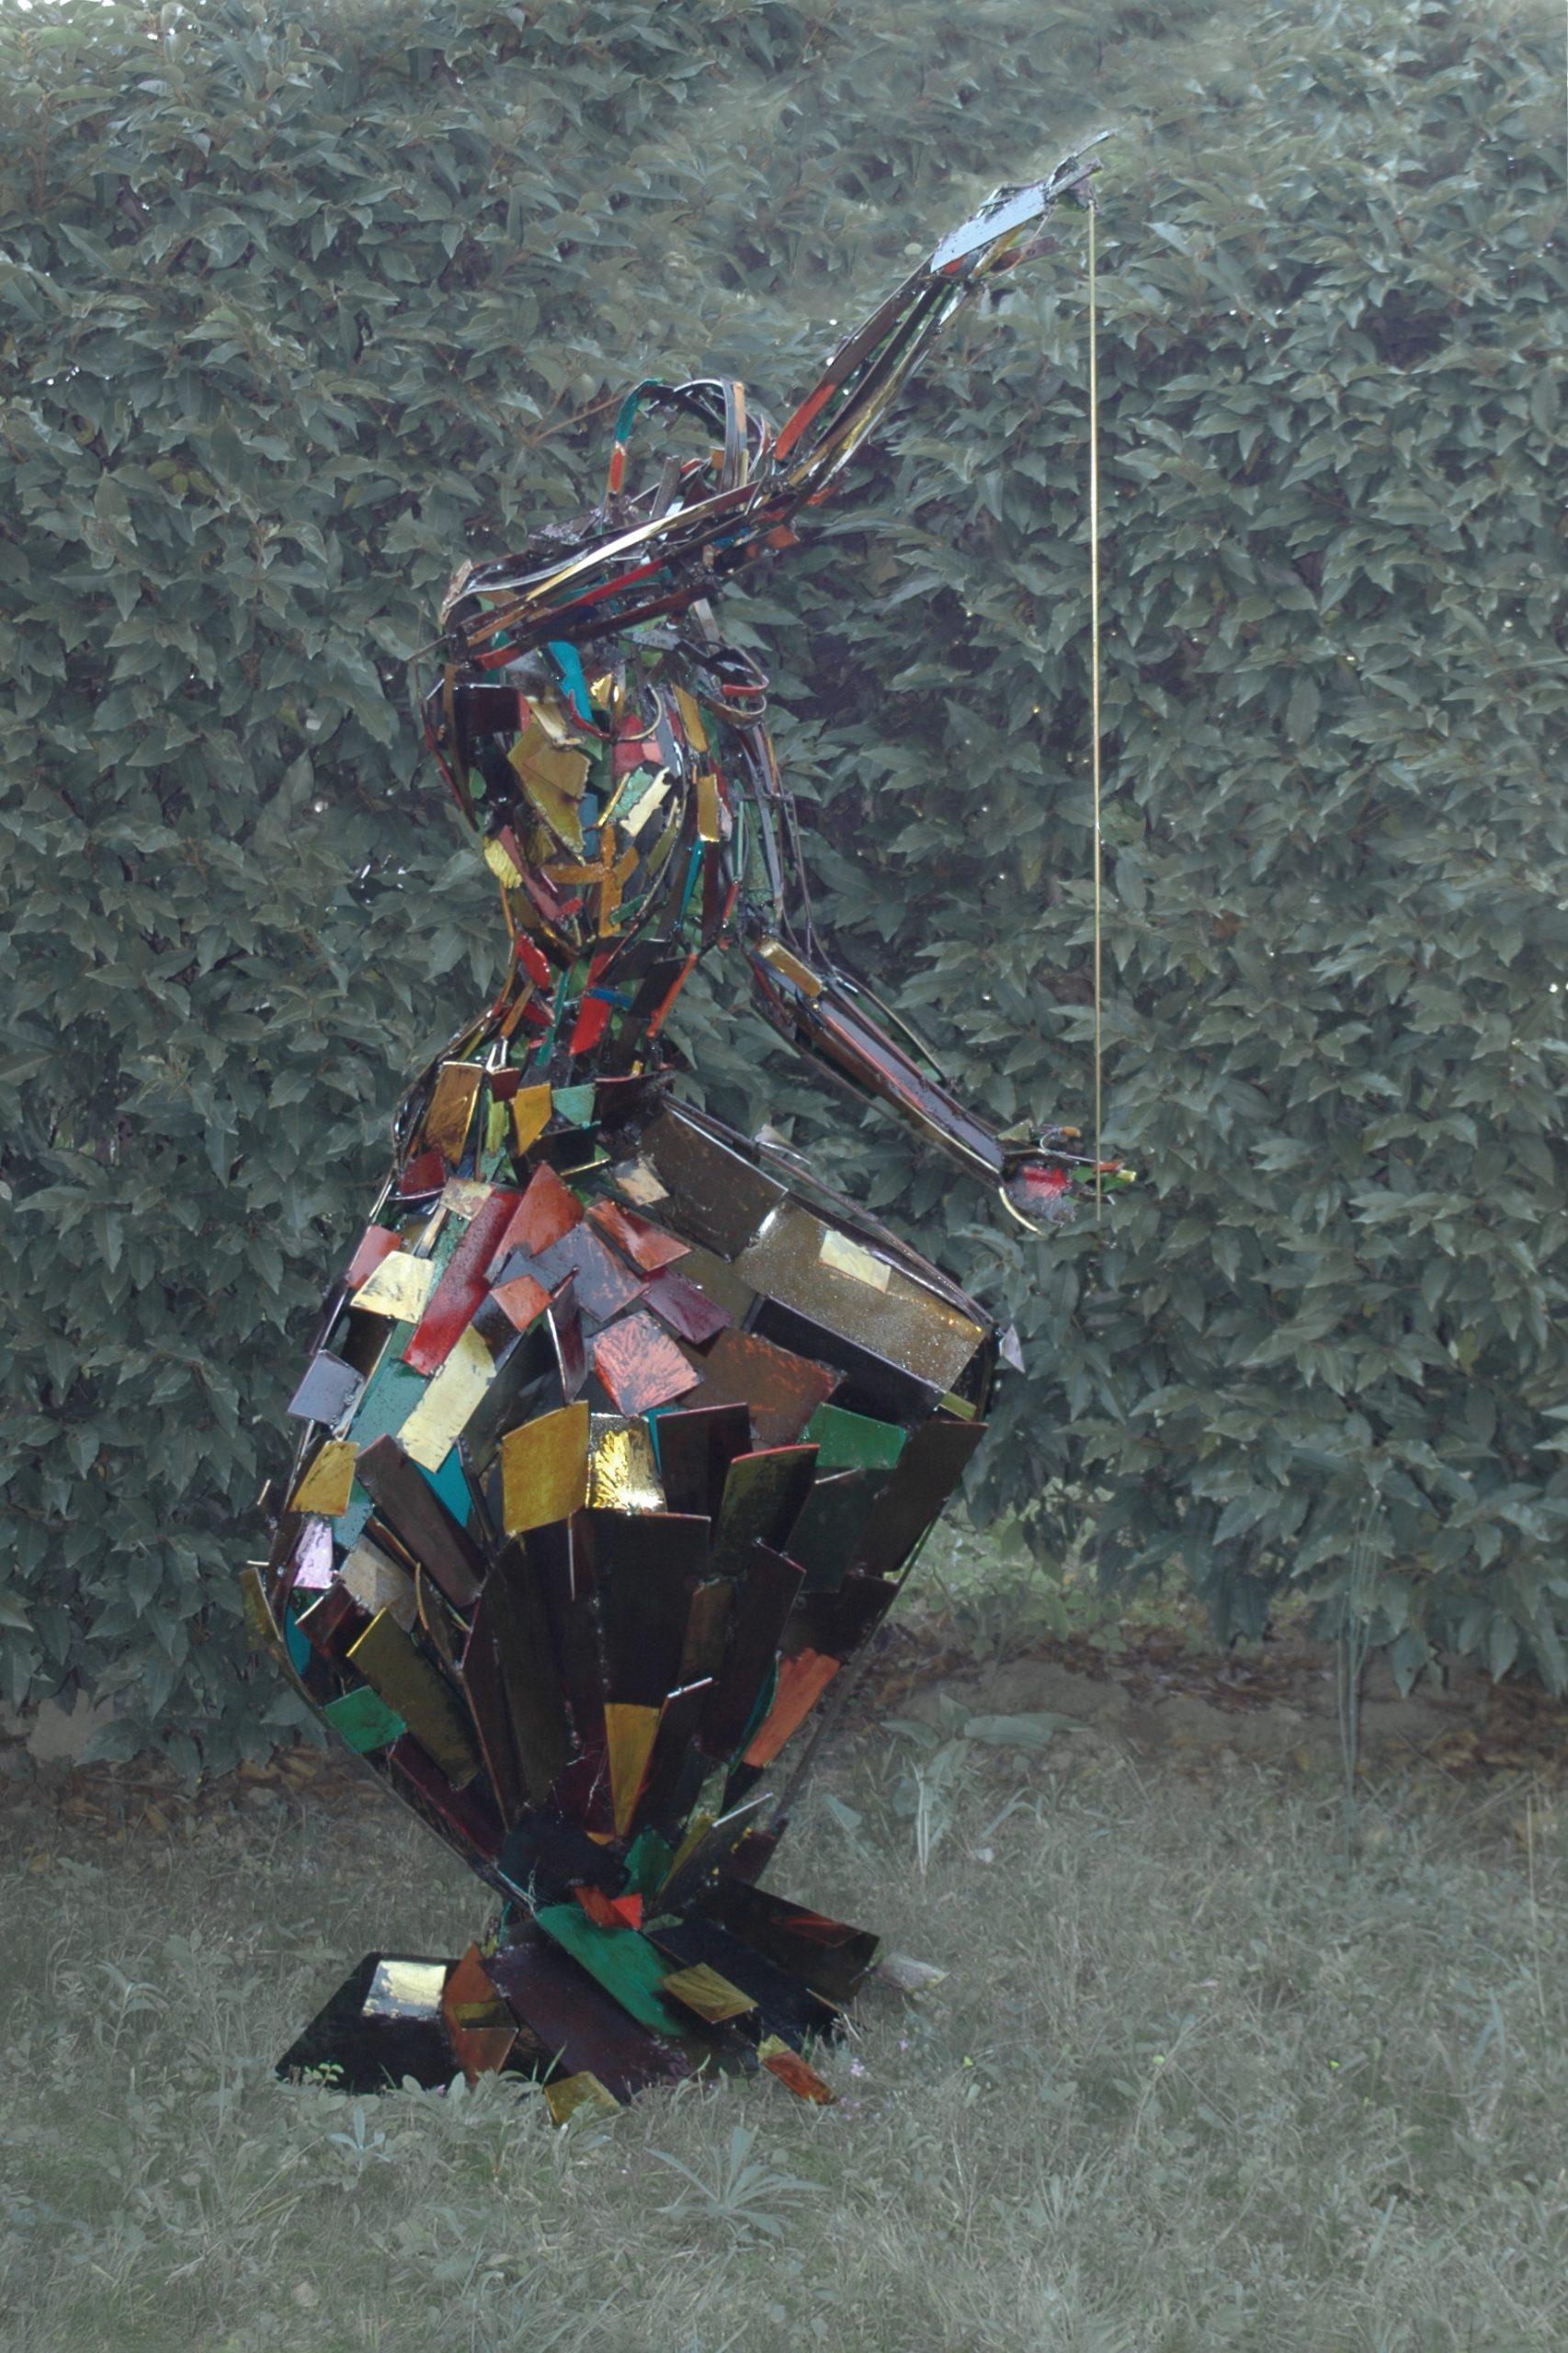 figura1 scaled - Installations